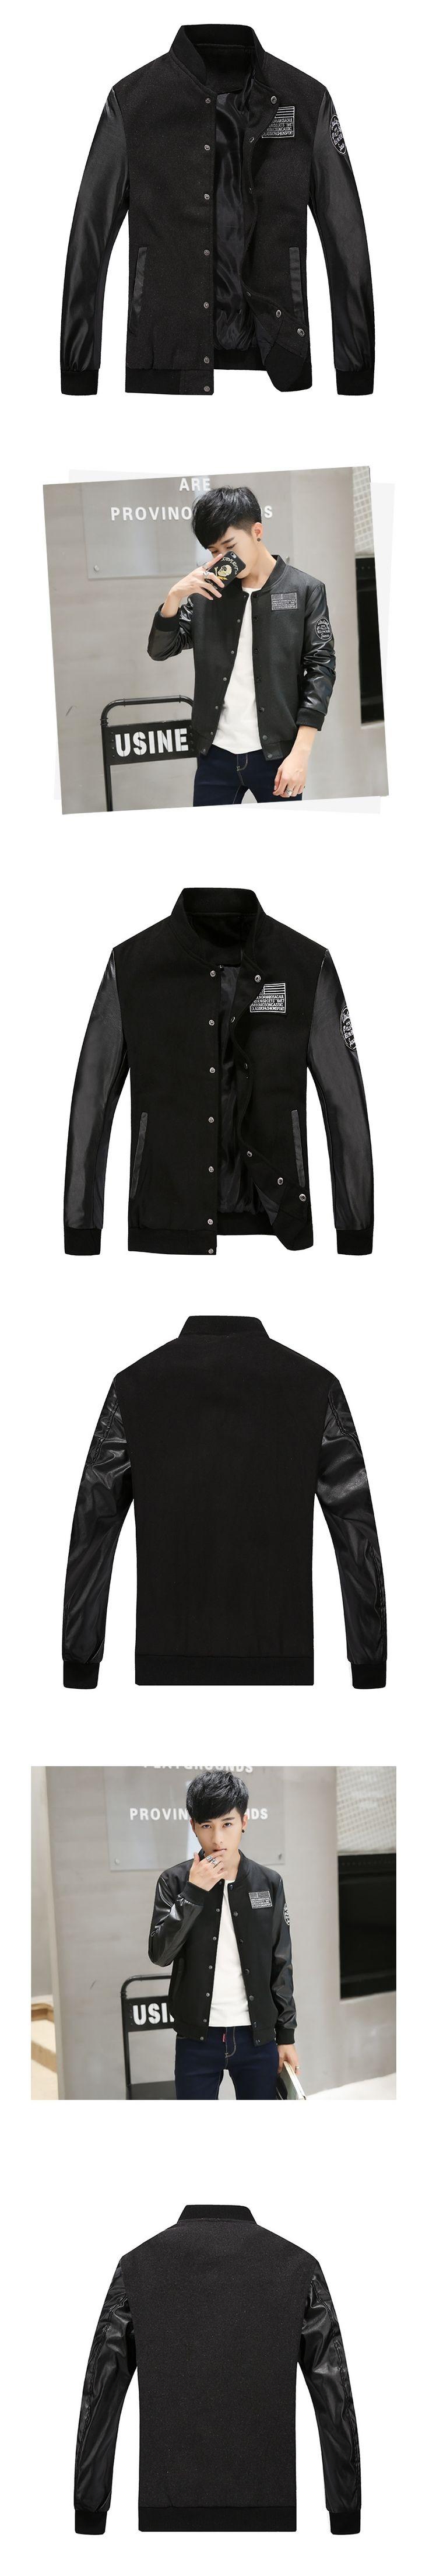 Jacket Bomber Men Spring Autumn Luxury Casual Windbreaker Outwear Warm Slim  Mandarin Collar Jacket Mens Clothing